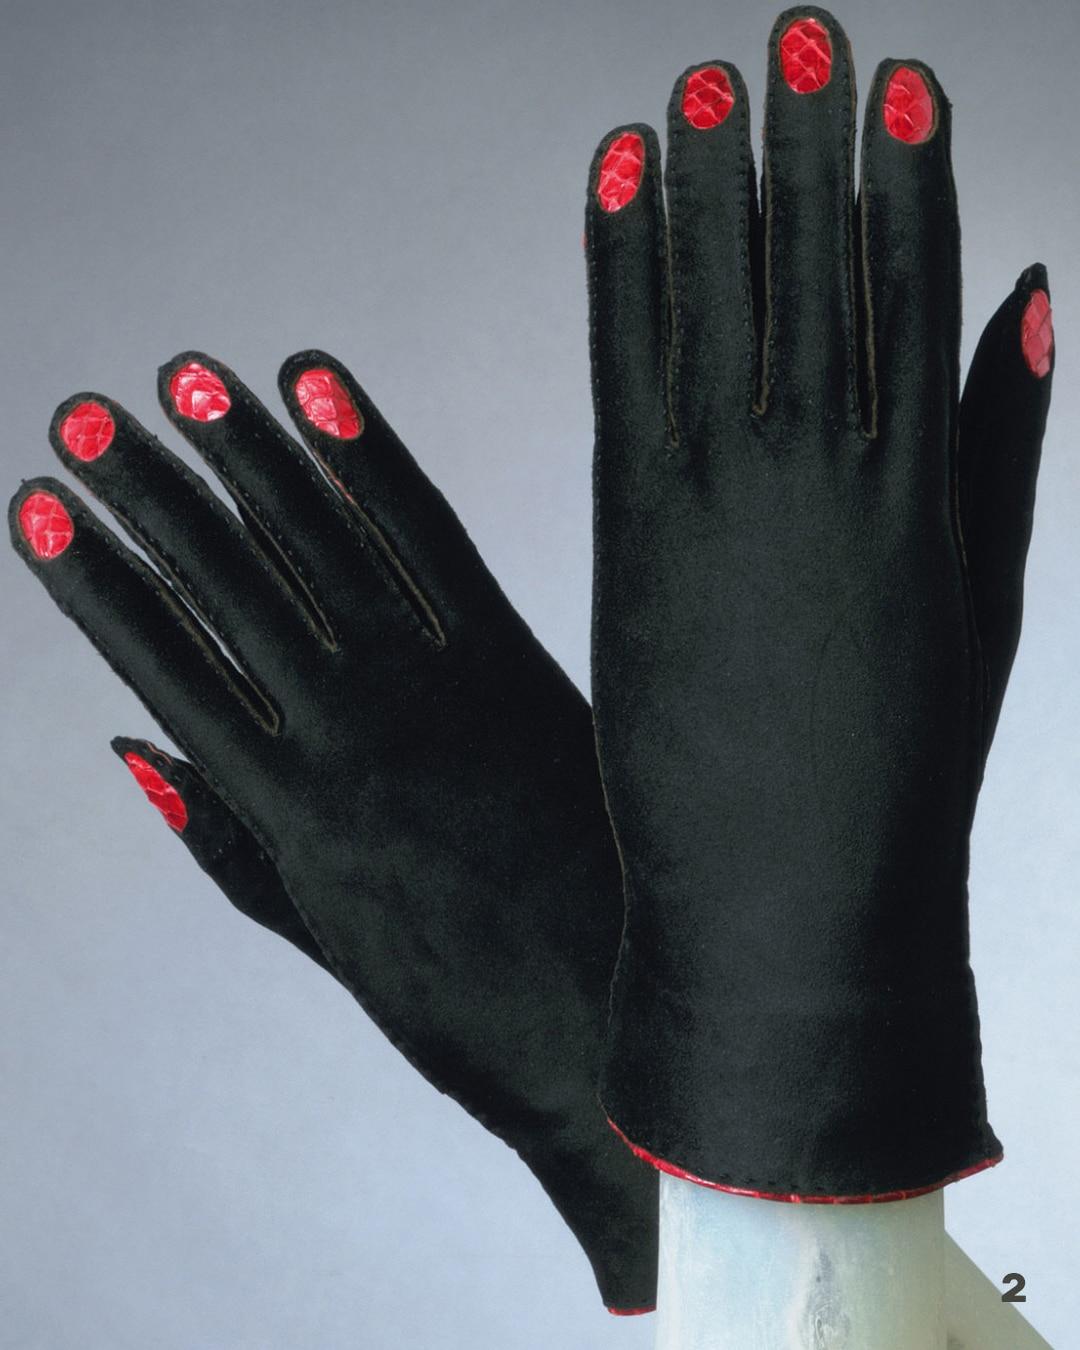 Elsa Schiaparelli Guanti design stile onirico